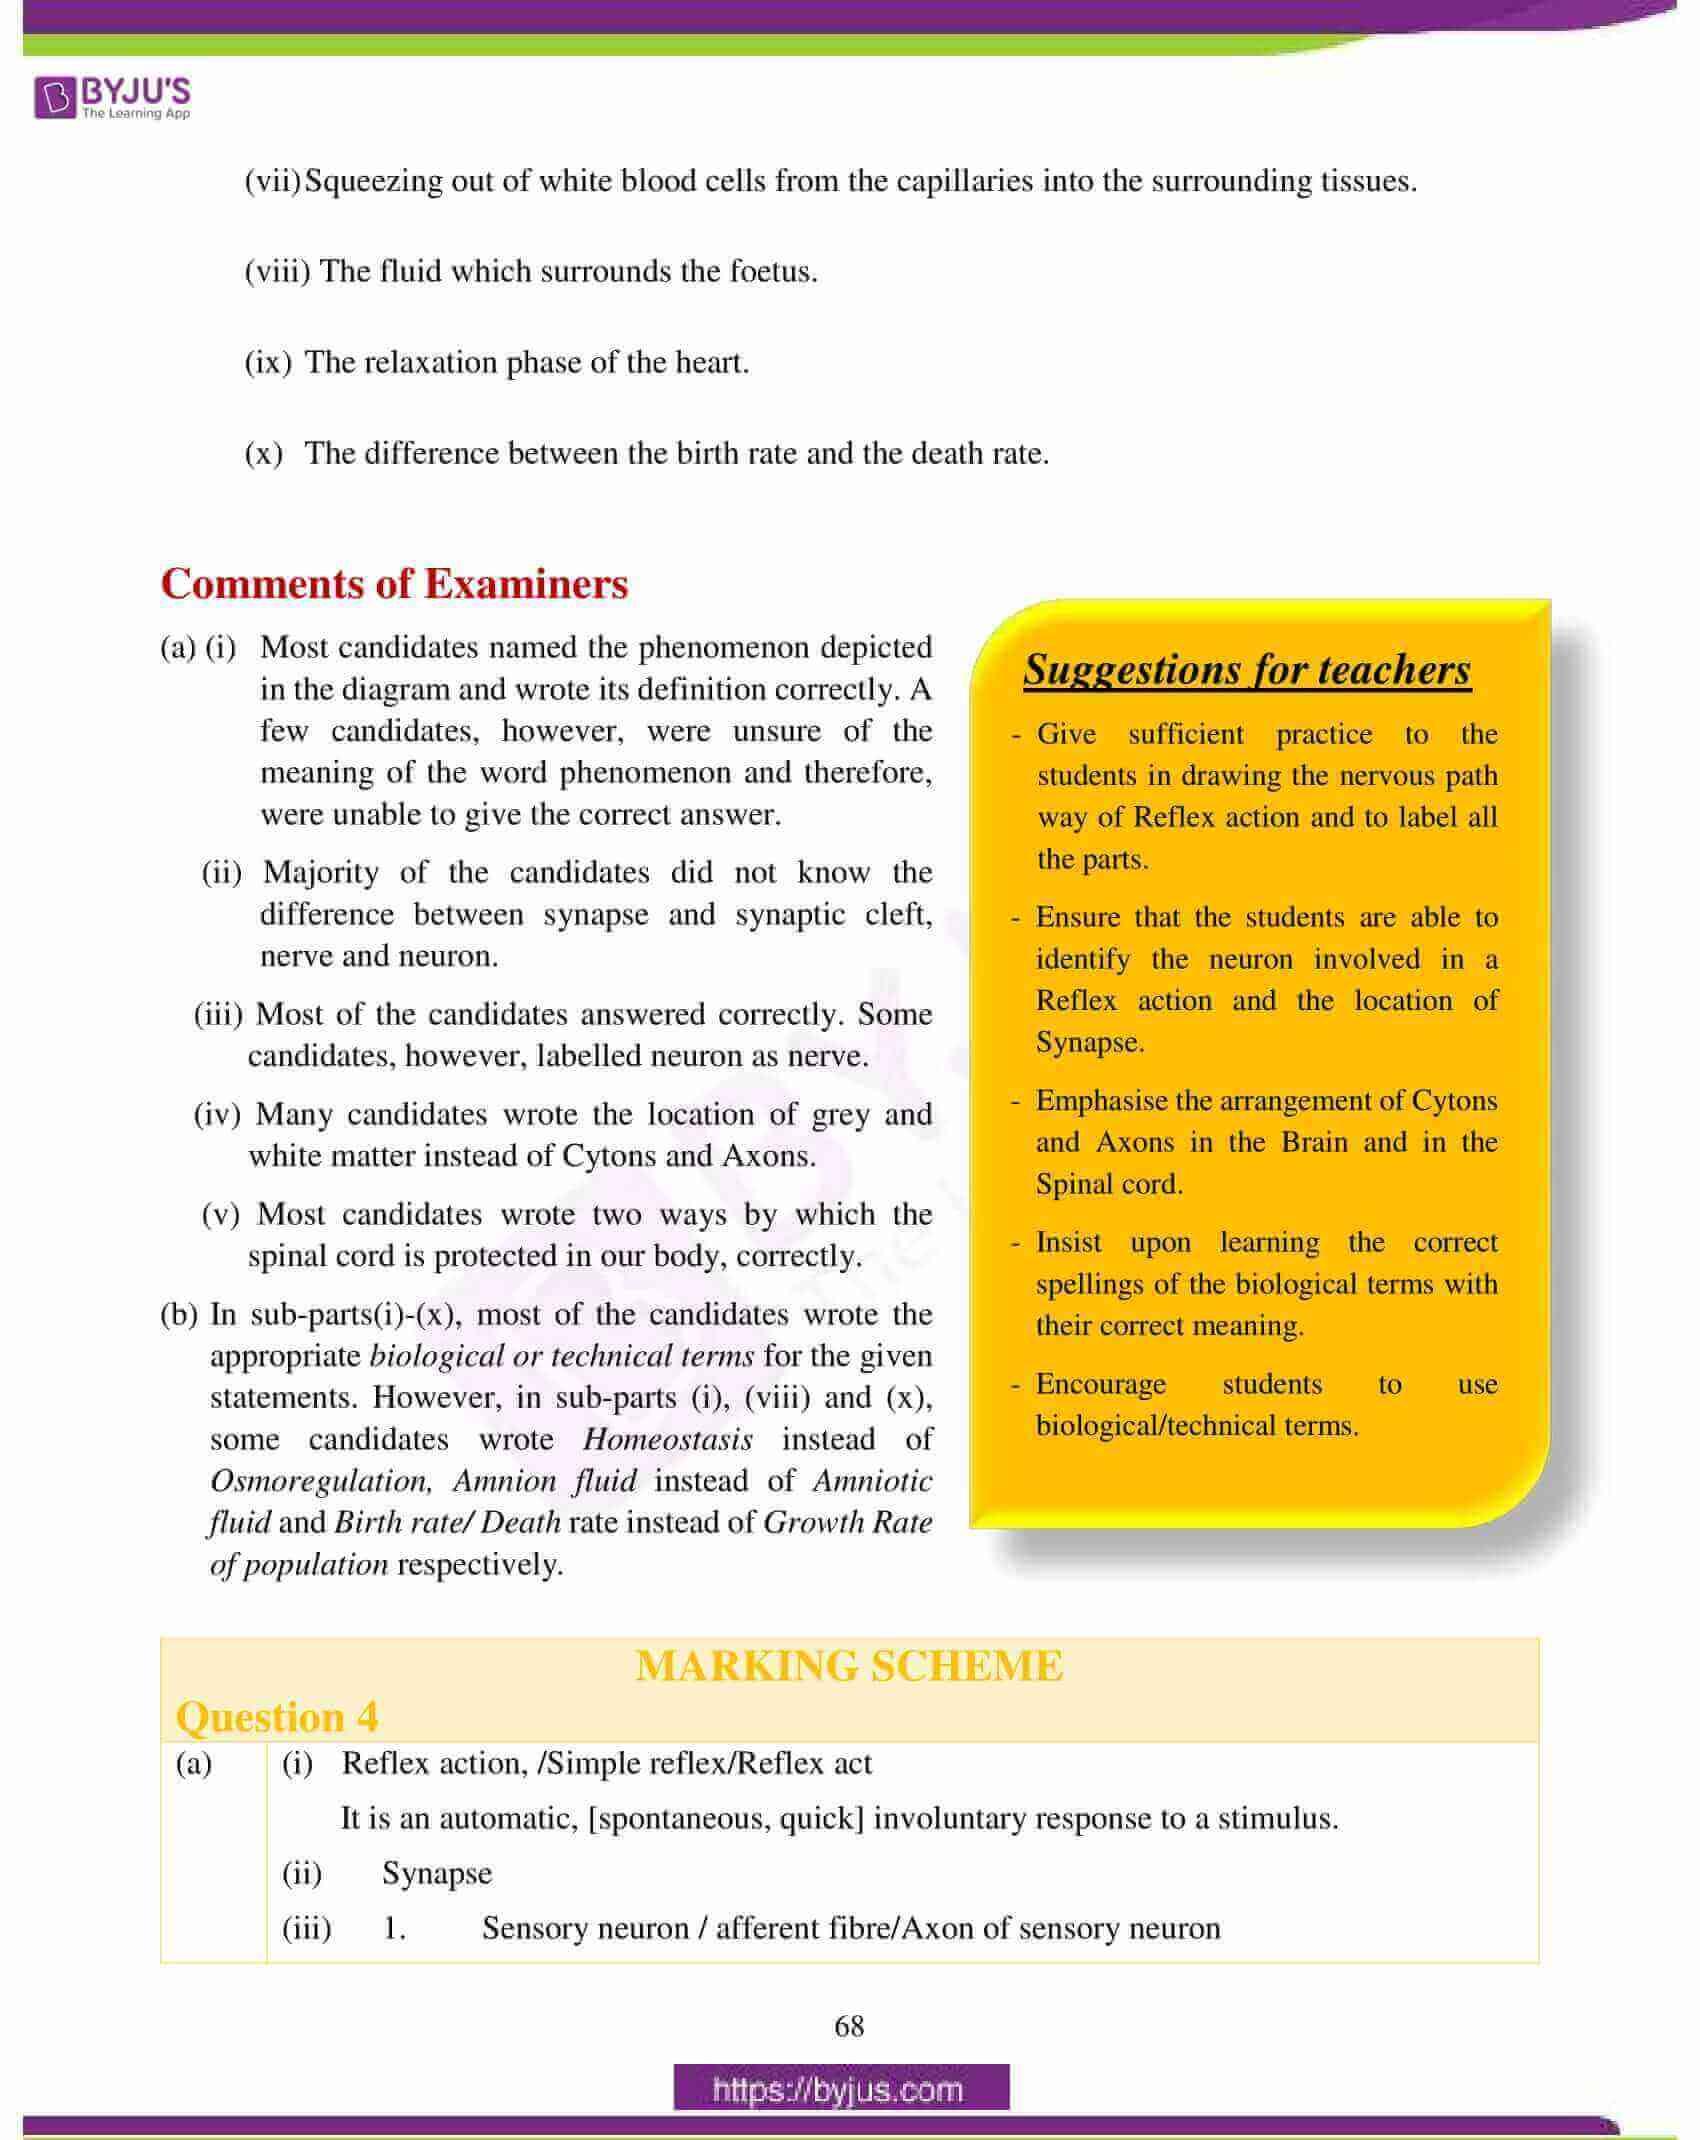 icse class 10 biology question paper solution 2018 15